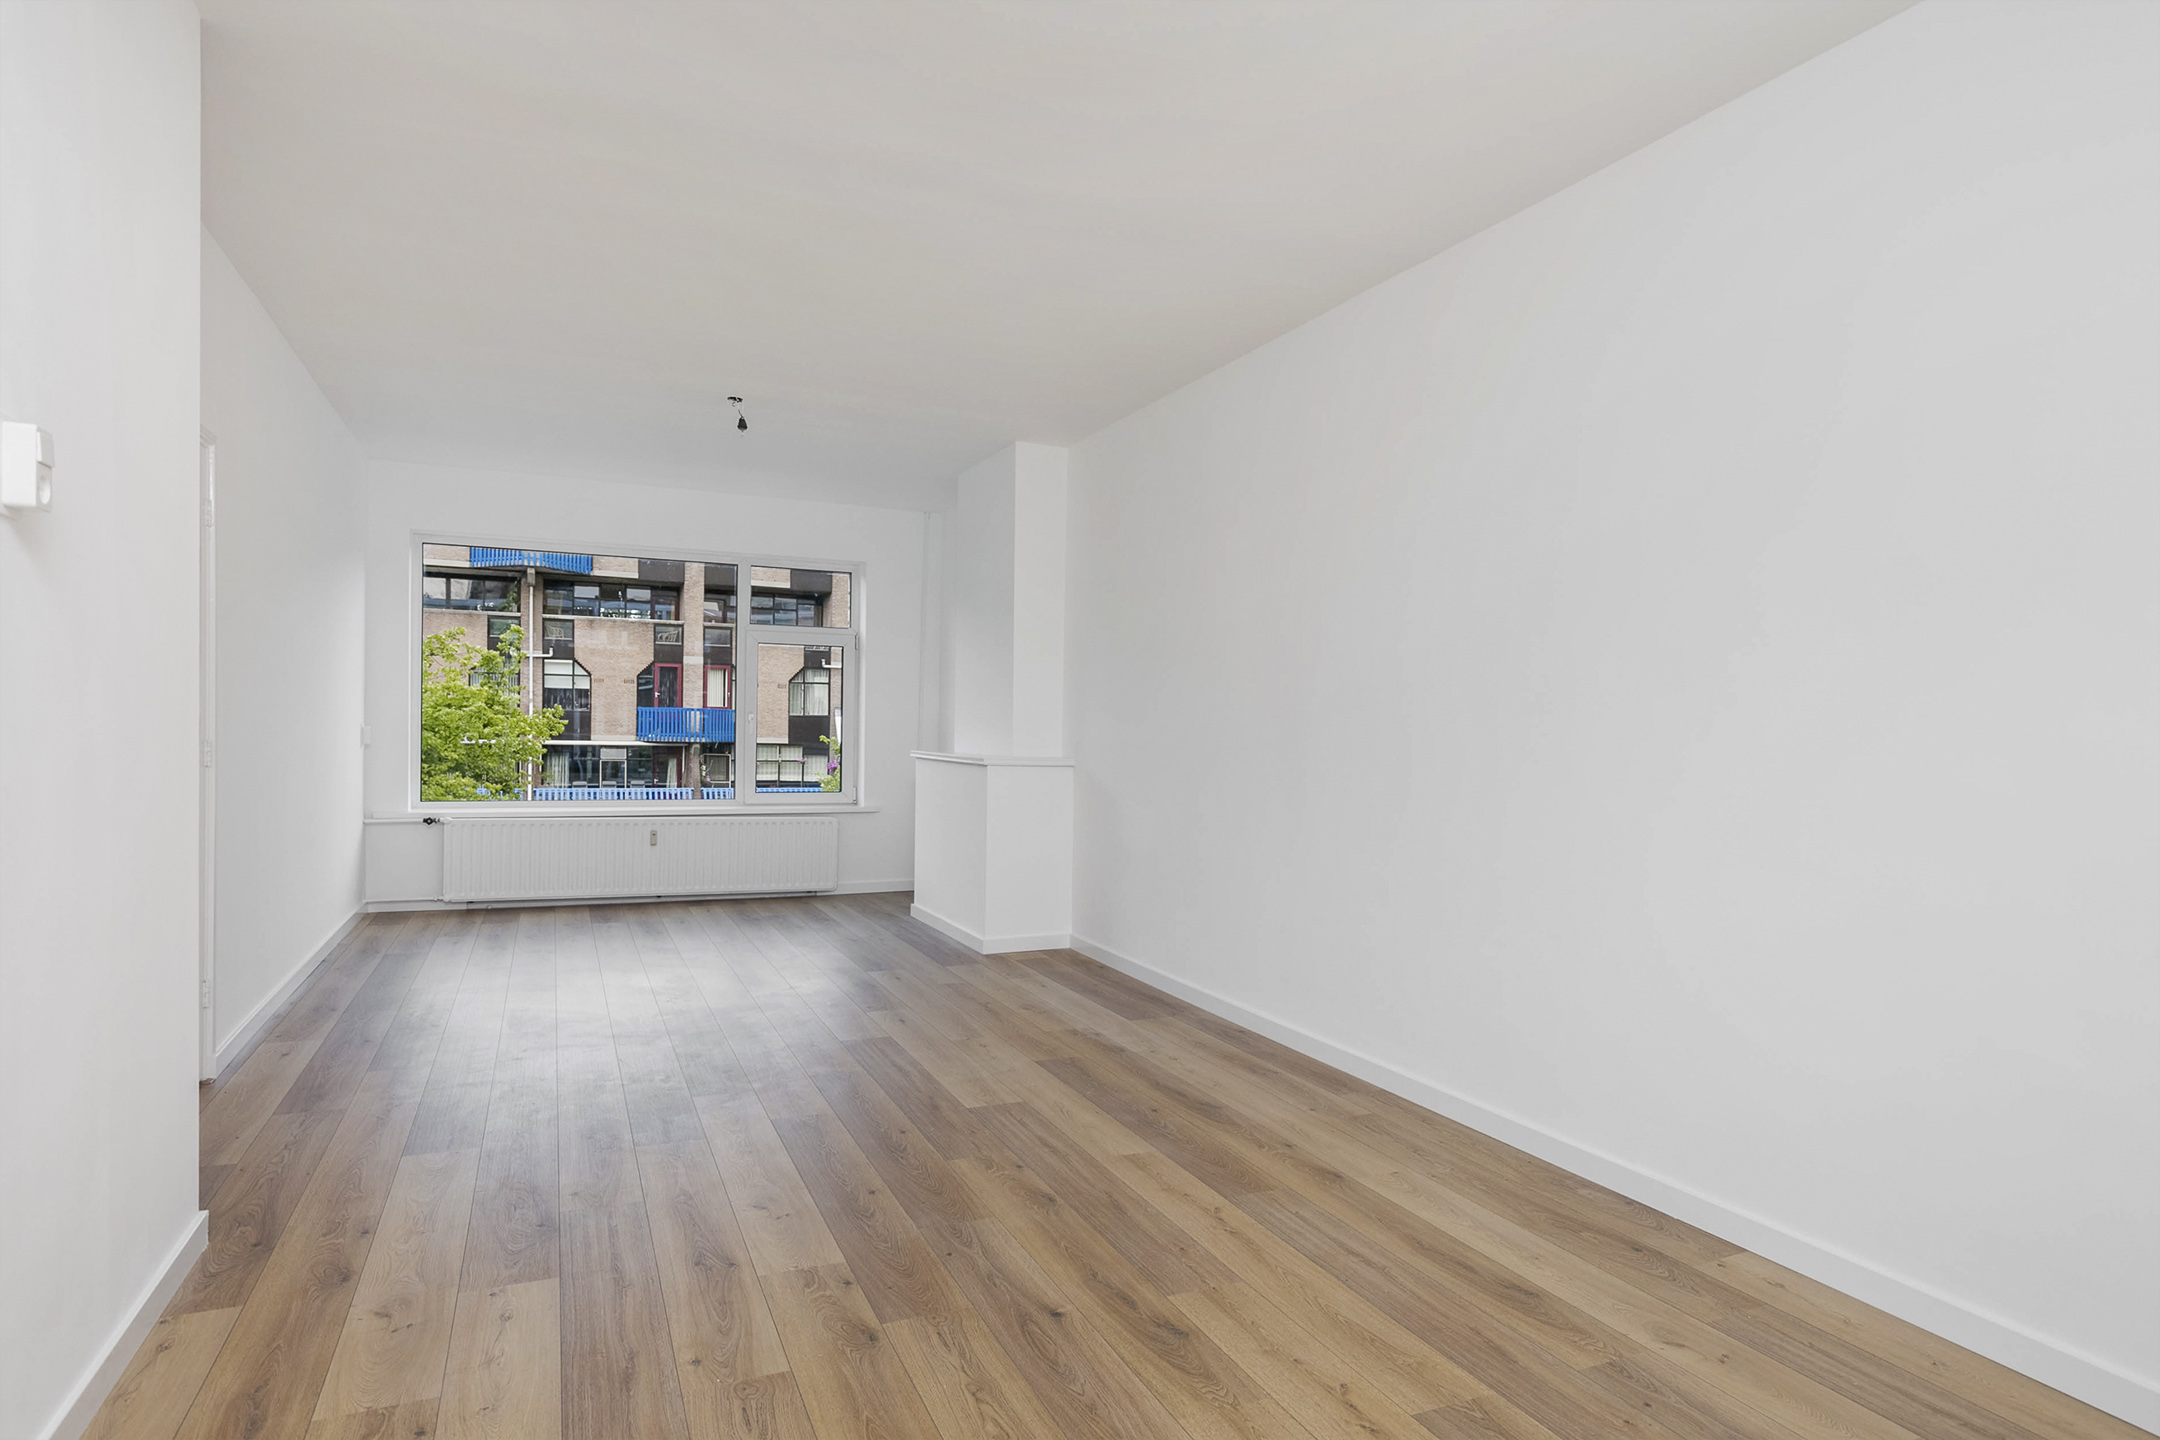 Laminate Flooring And Plastering Walls Ceiling